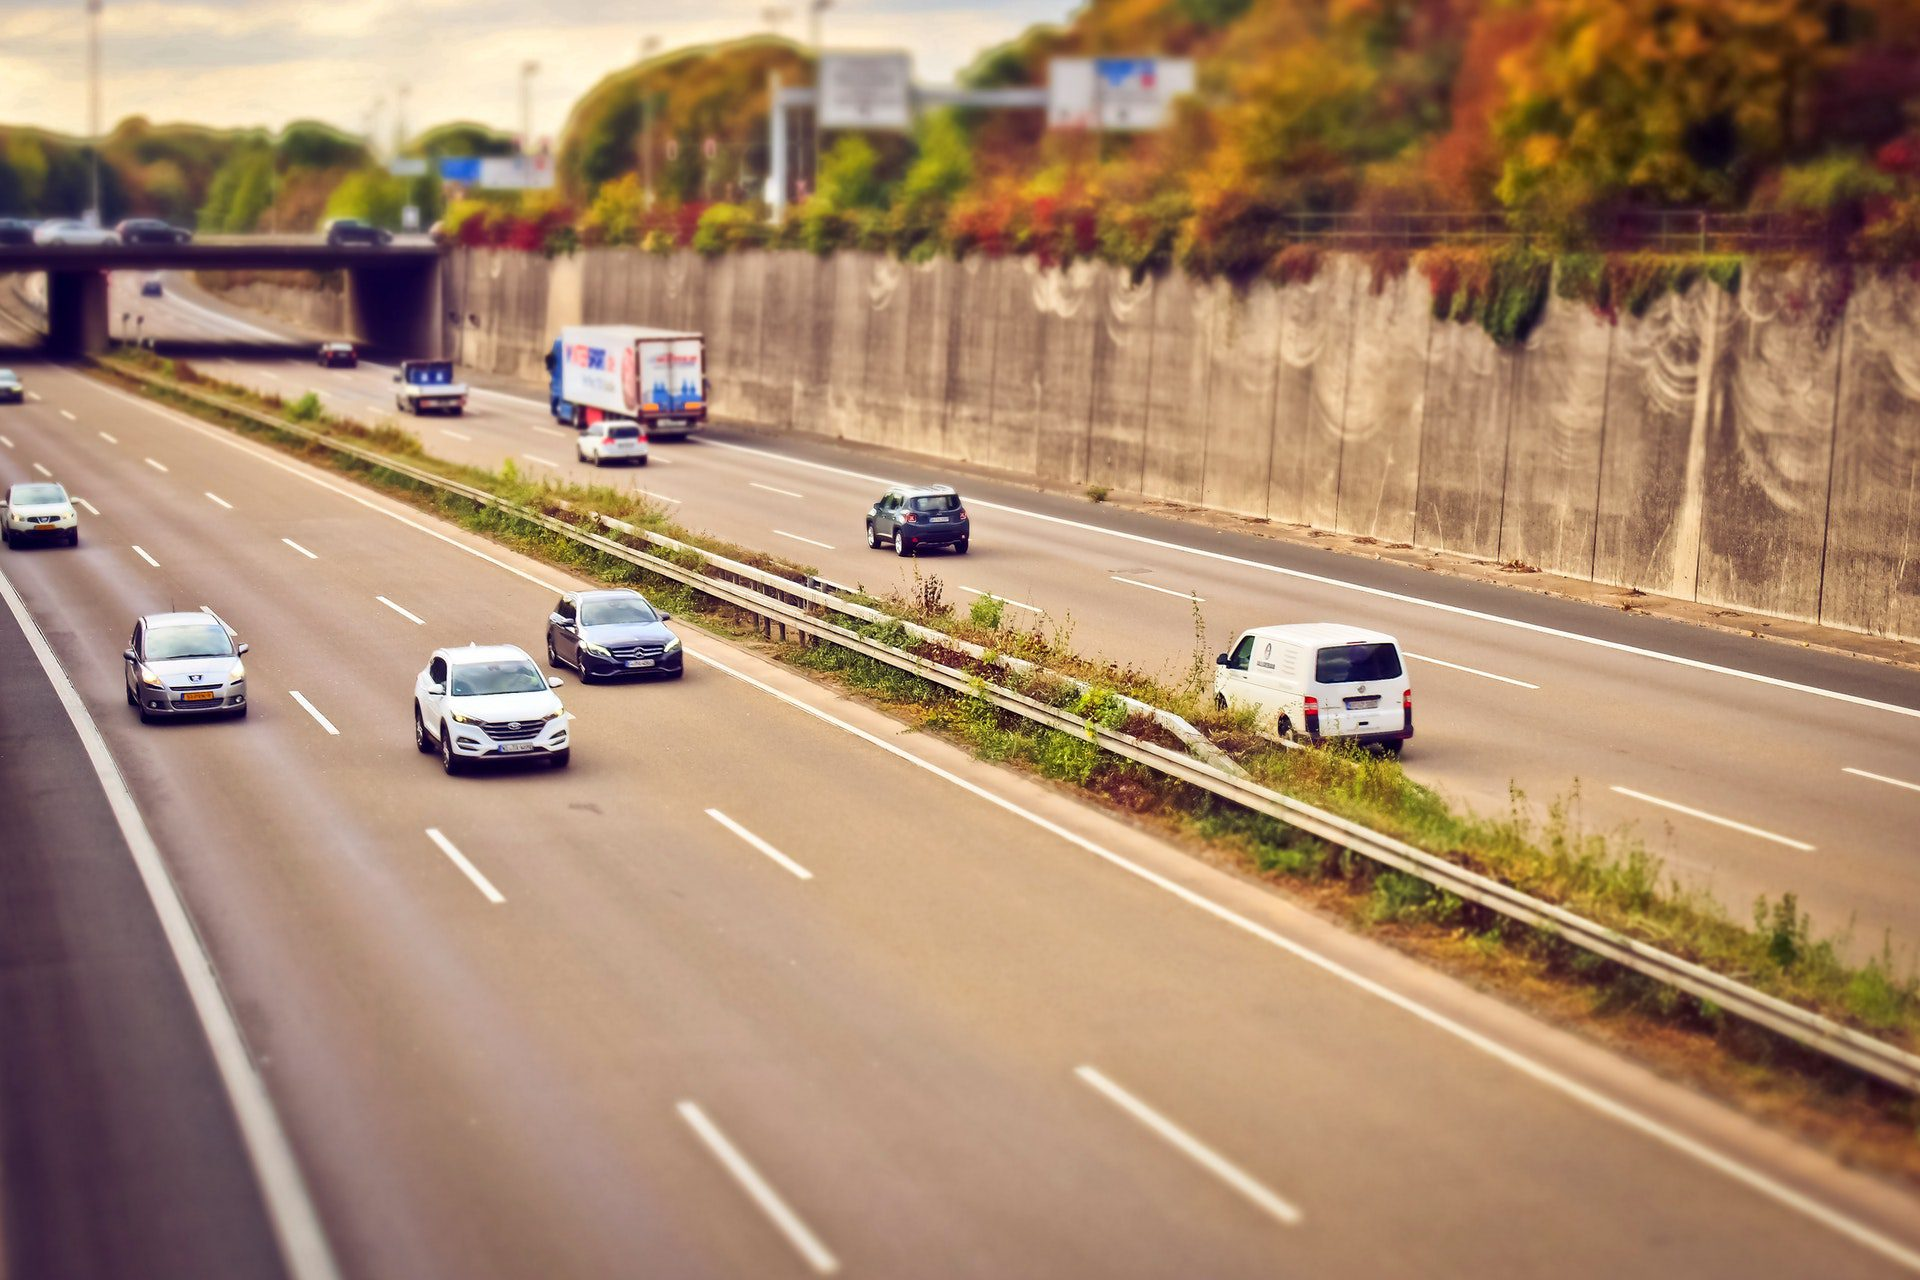 Daytime highway traffic